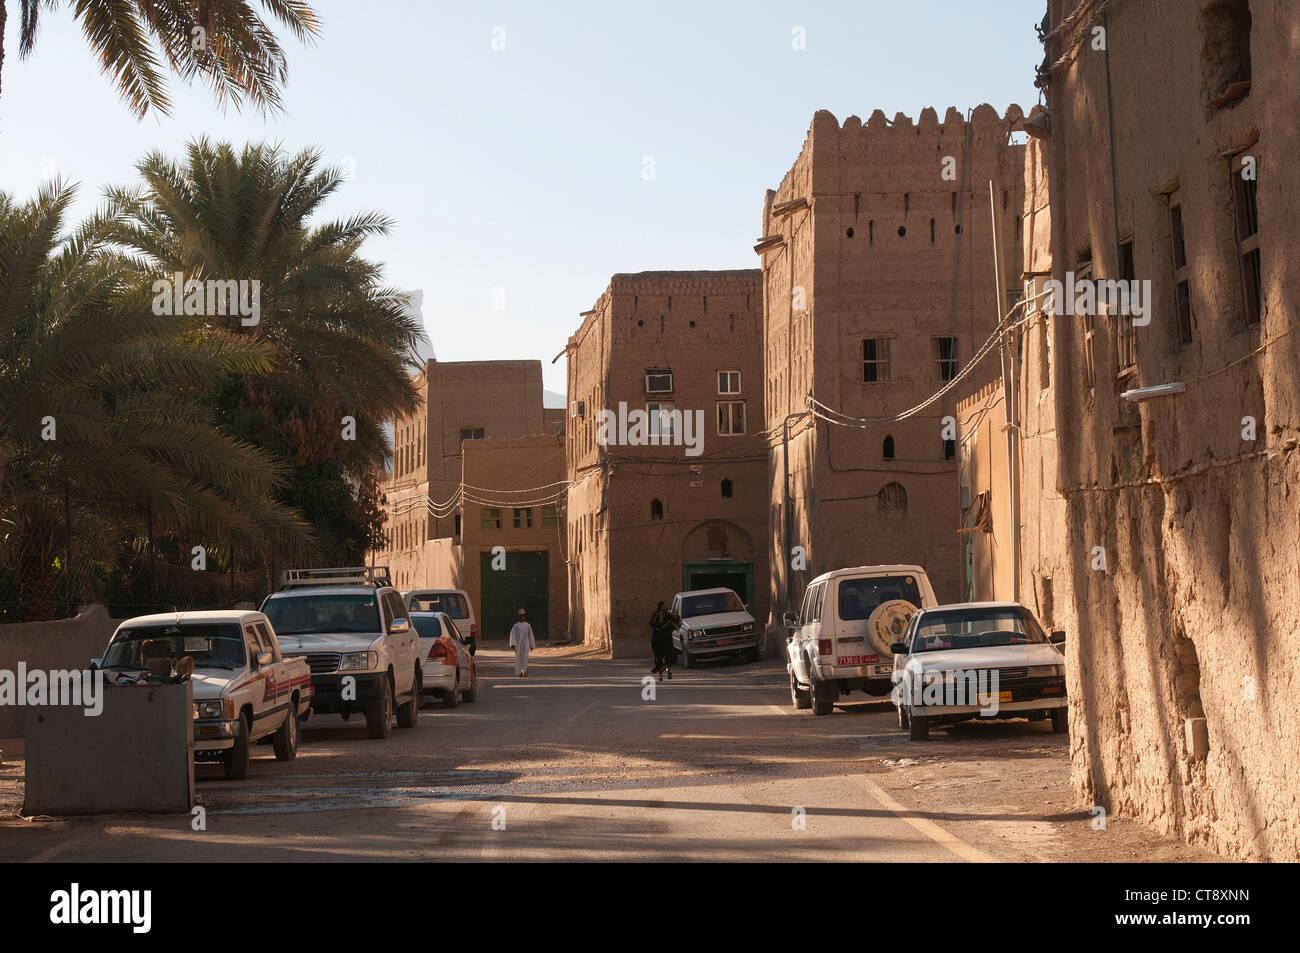 Elk207-2557 Oman, Al Hamra, old town, houses - Stock Image